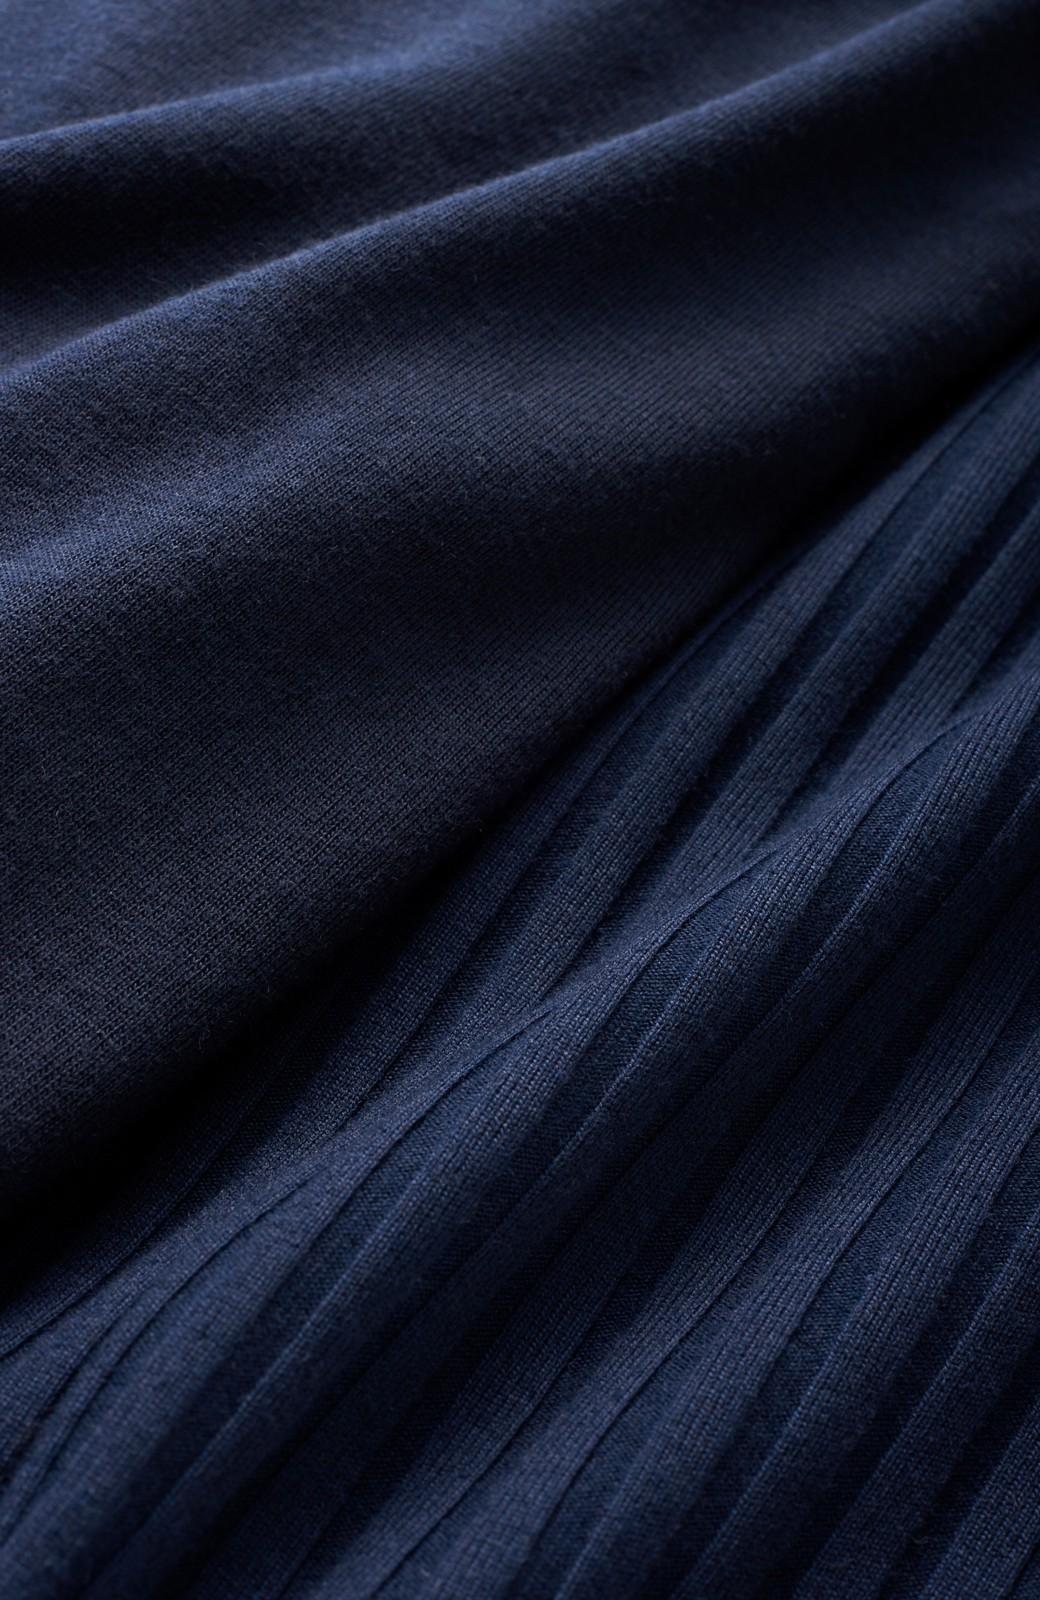 haco! 旅の救世主!3泊4日のテレコオールインワン&大人っぽTシャツセット <ネイビー>の商品写真2